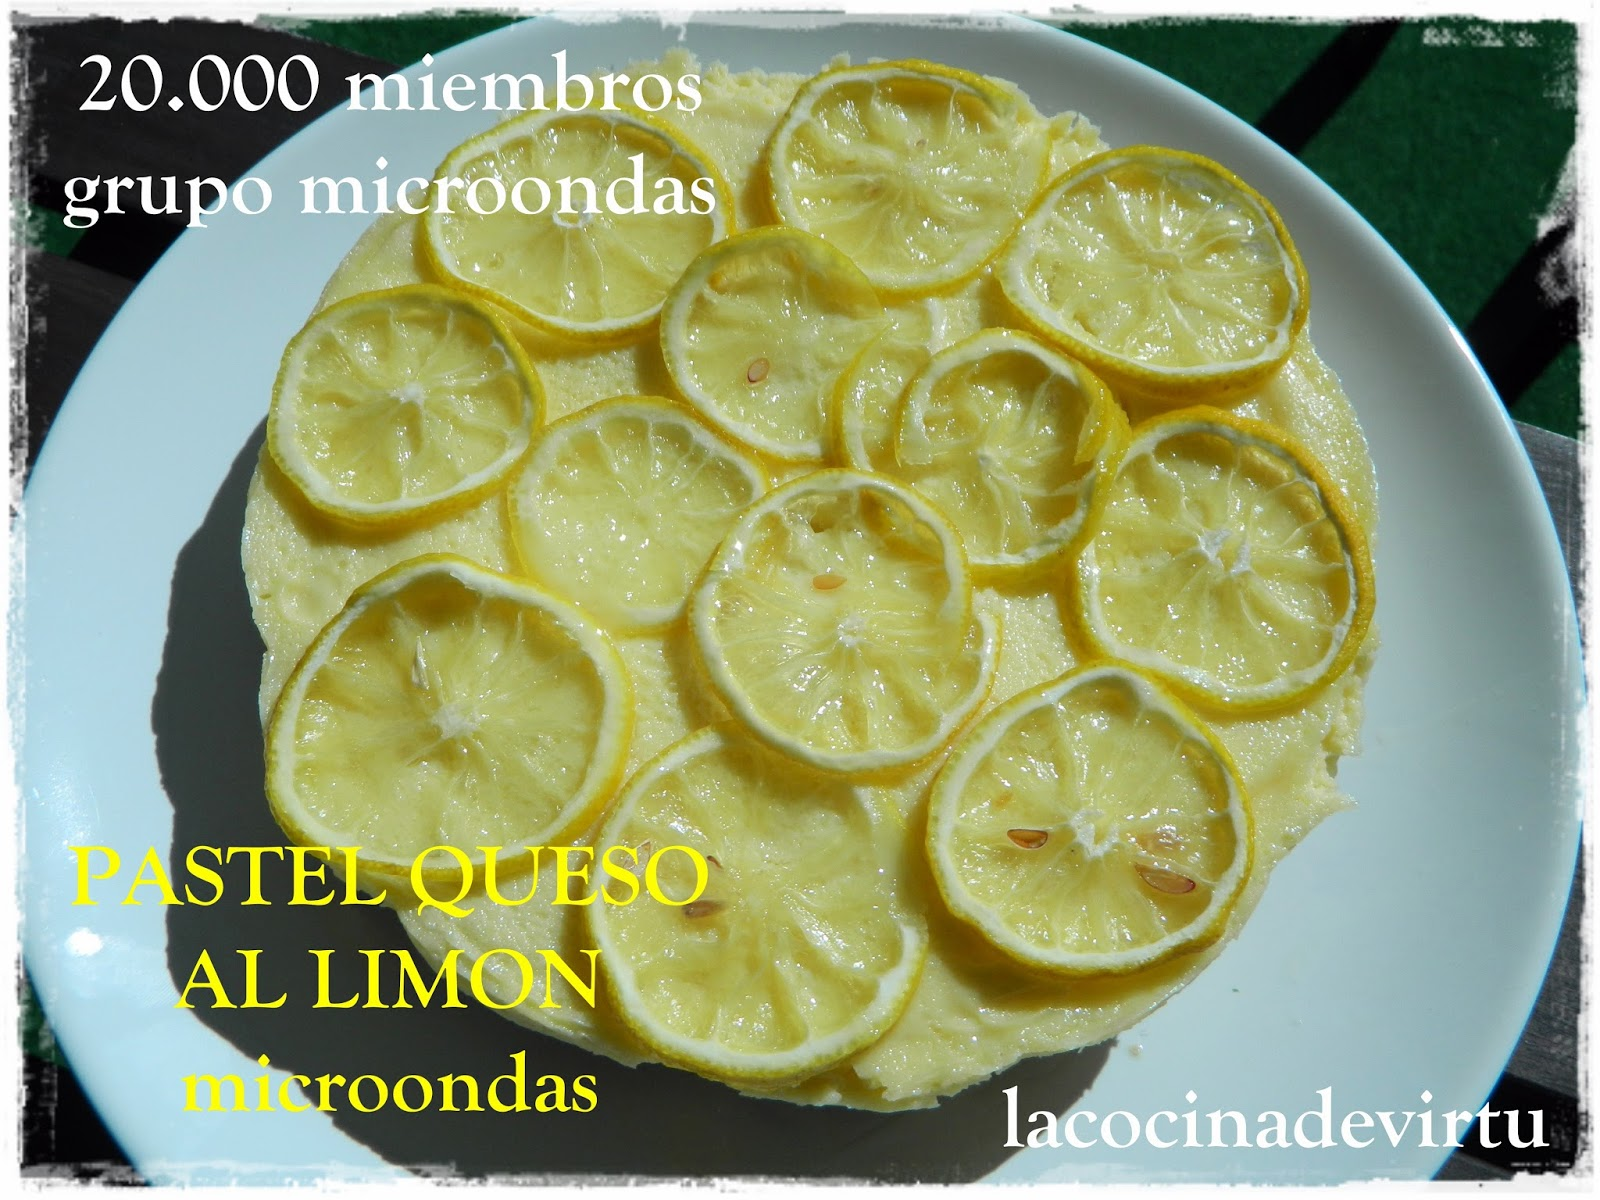 http://lacocinadevirtu.blogspot.com.es/2014/03/tarta-queso-al-limon-microondas.html